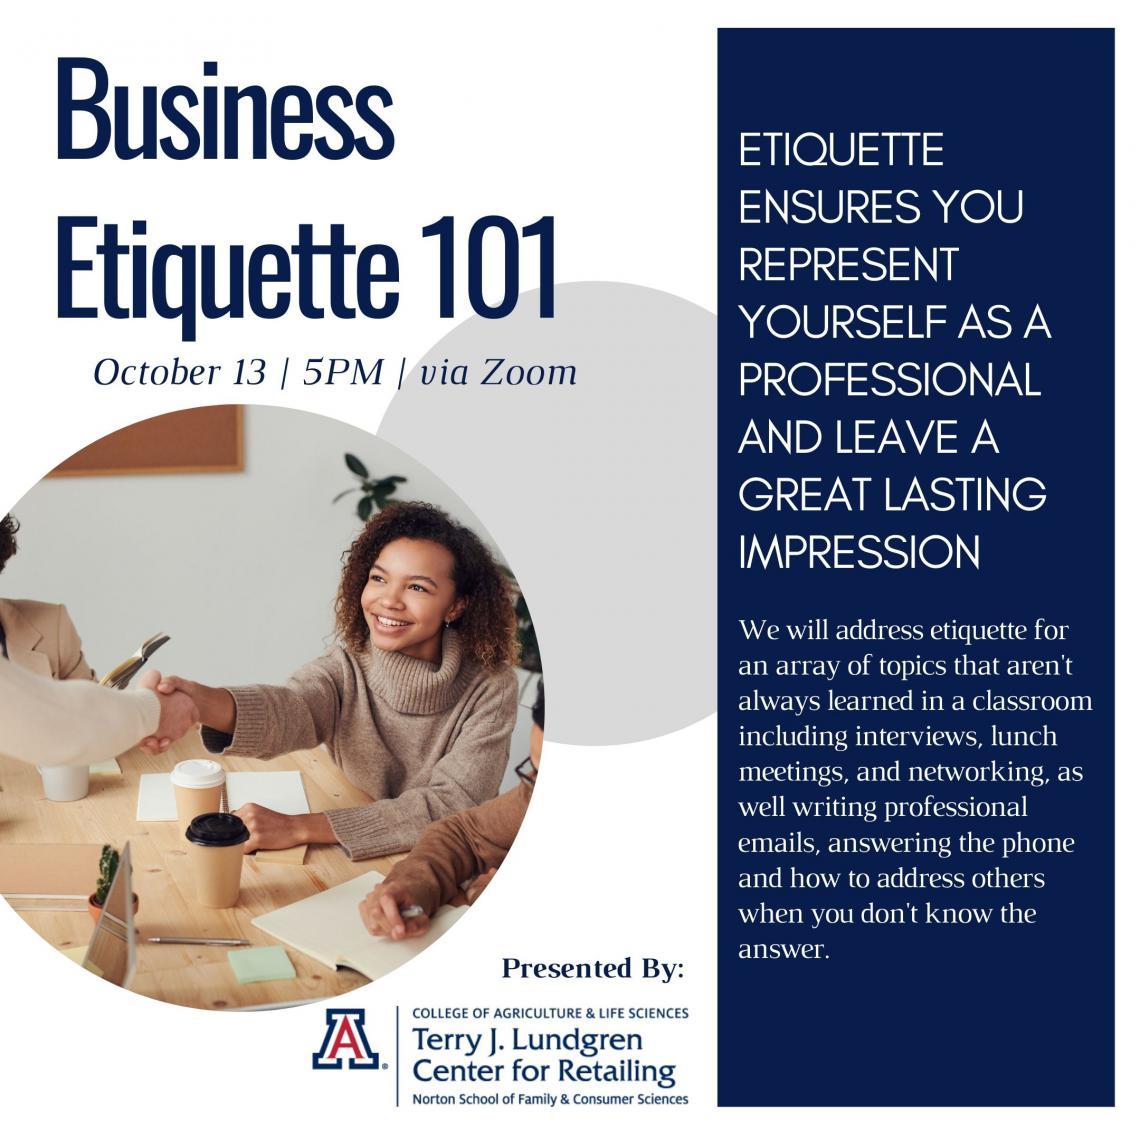 Flyer for Business Etiquette 101